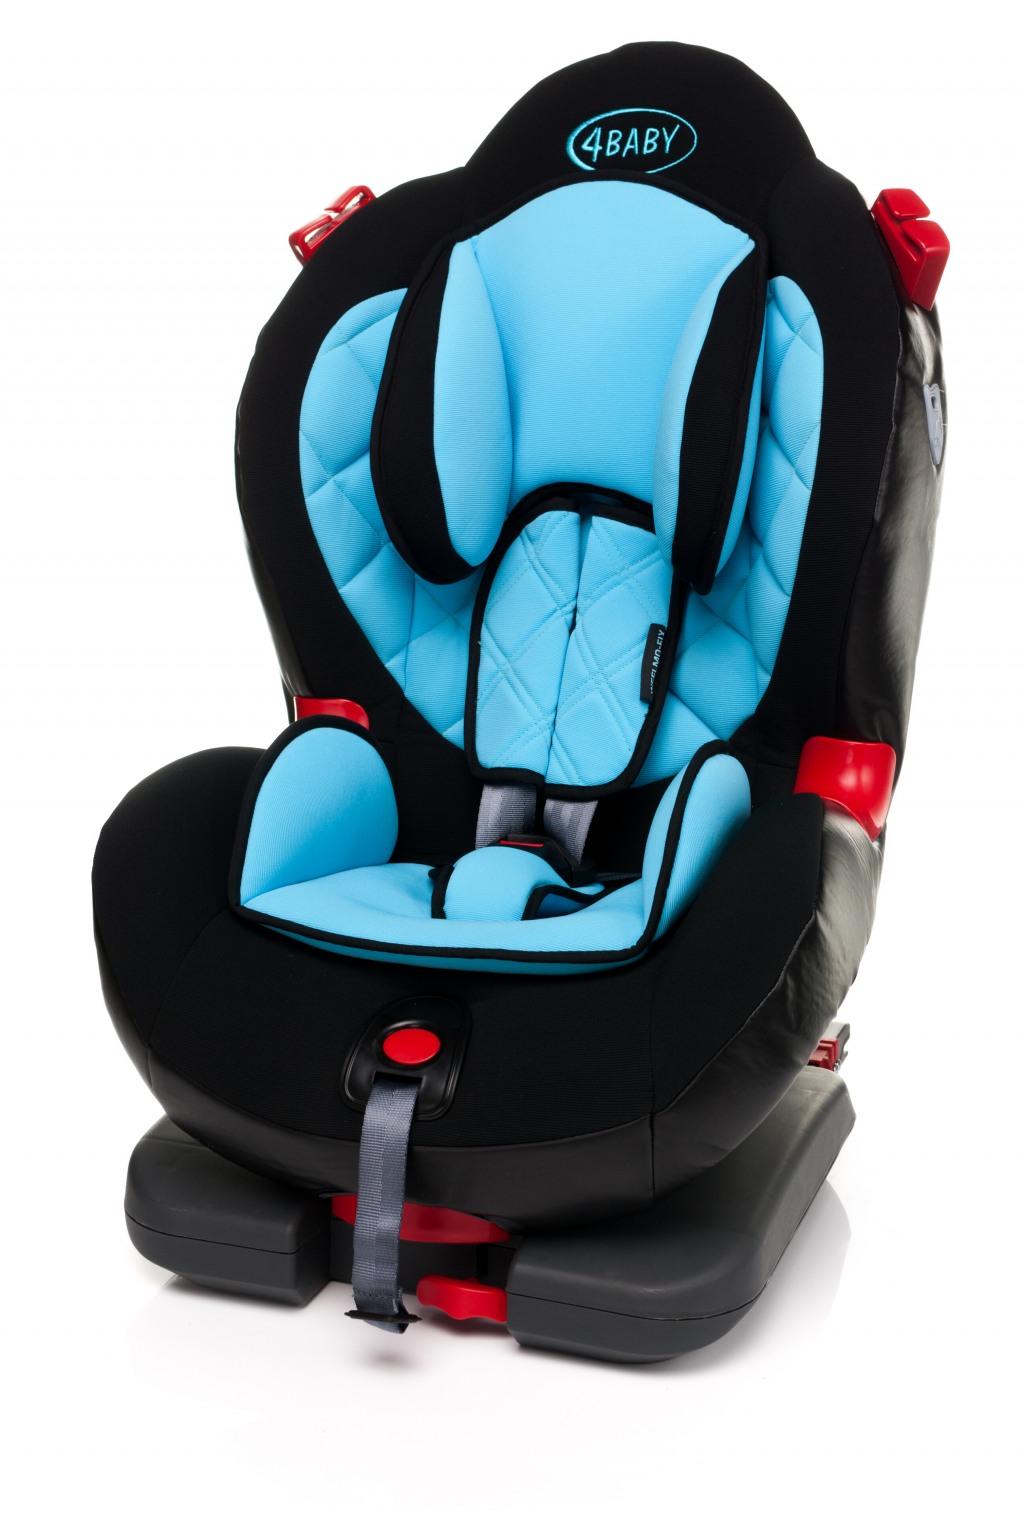 Weelmo Fix 4baby Autosedacka 9 25kg Tiva Baby